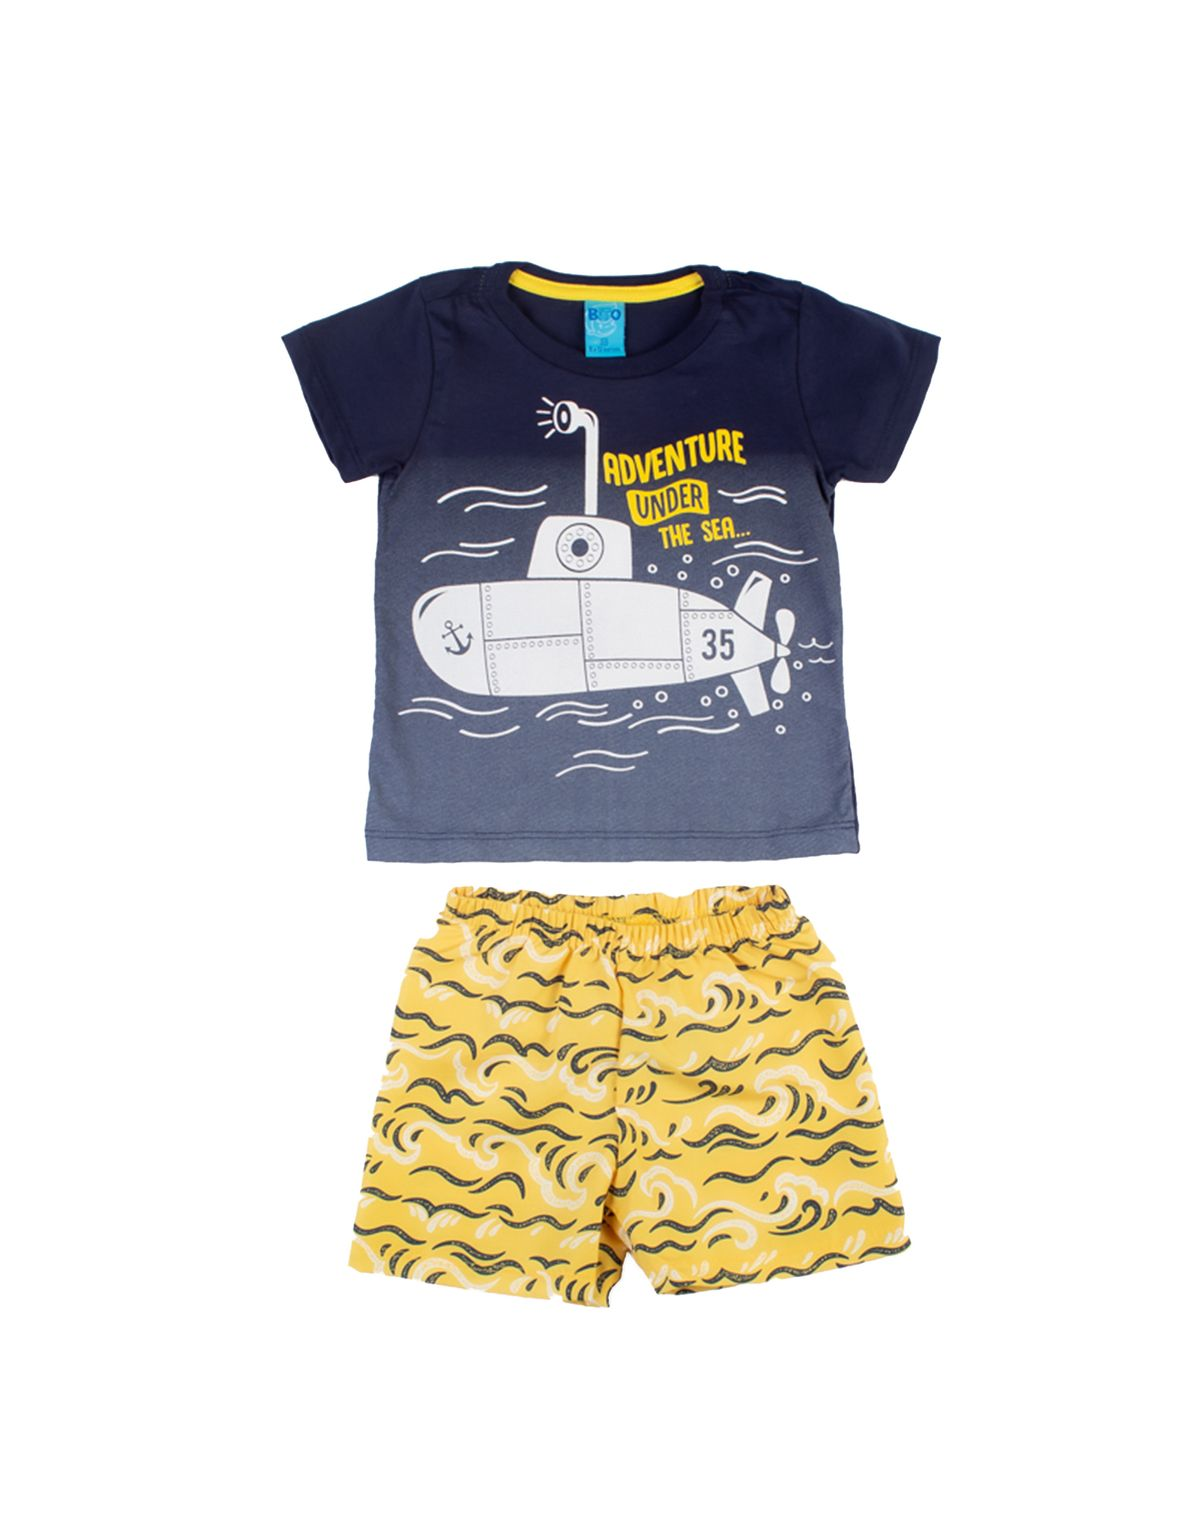 565923005-conjunto-curto-bebe-menino-estampa-submarino-marinho-amarelo-2-b43